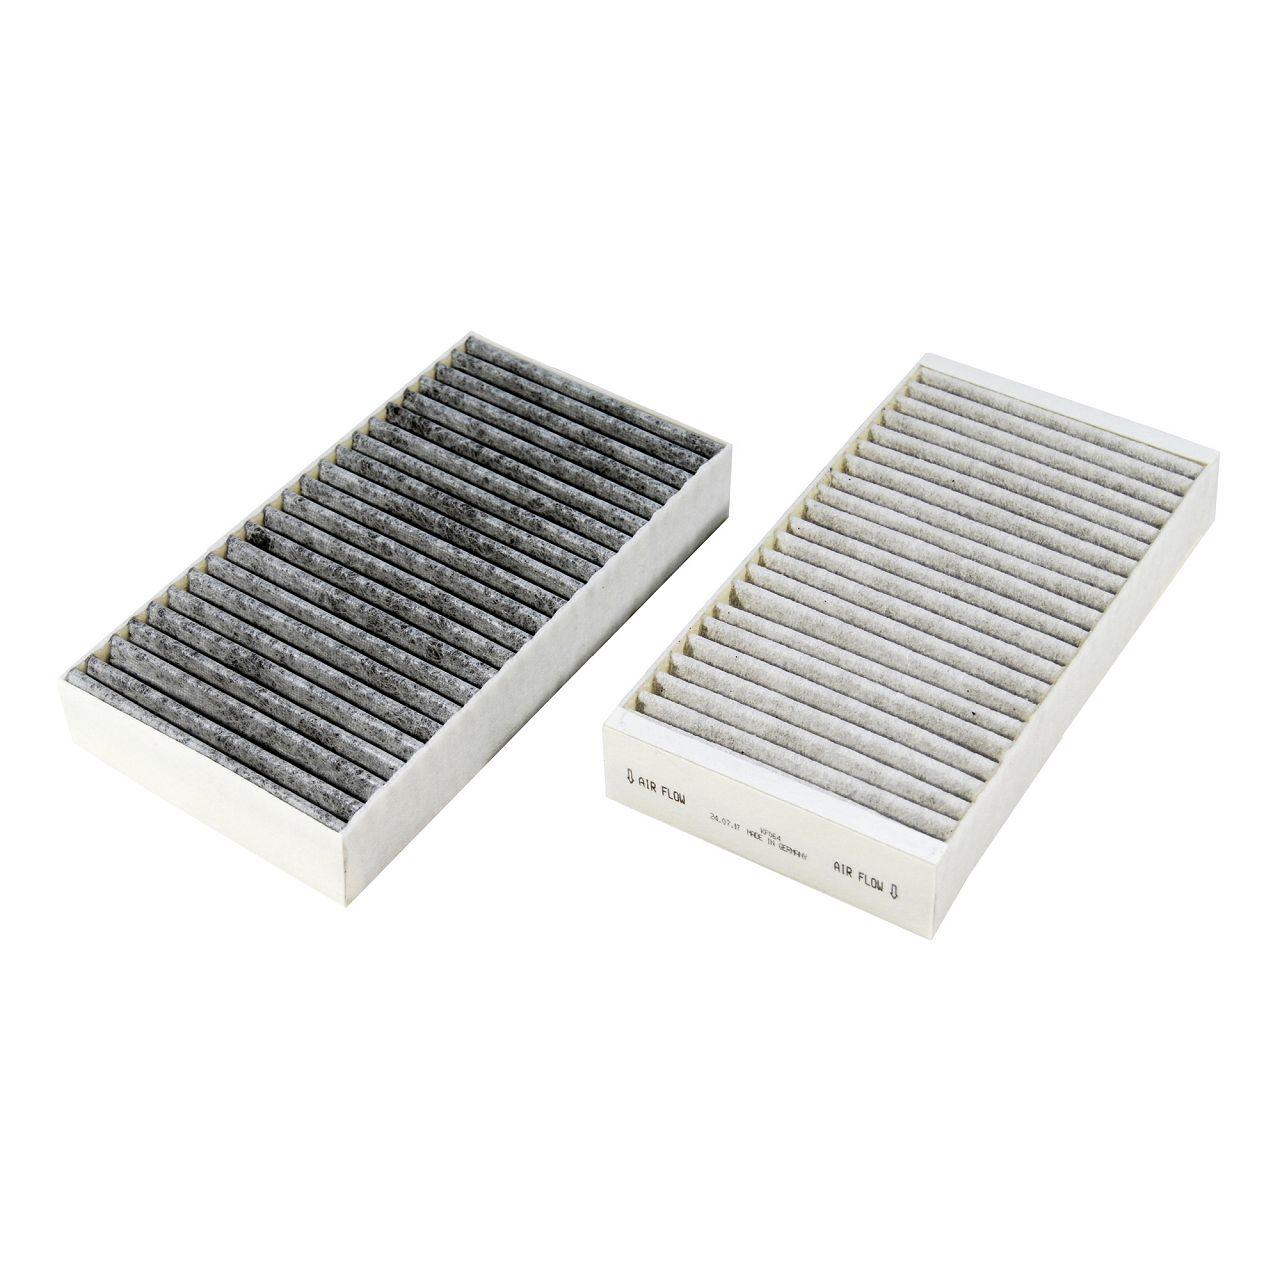 Inspektionskit Filterpaket Filterset für Mercedes X164 W164 W251 V251 280-350CDI